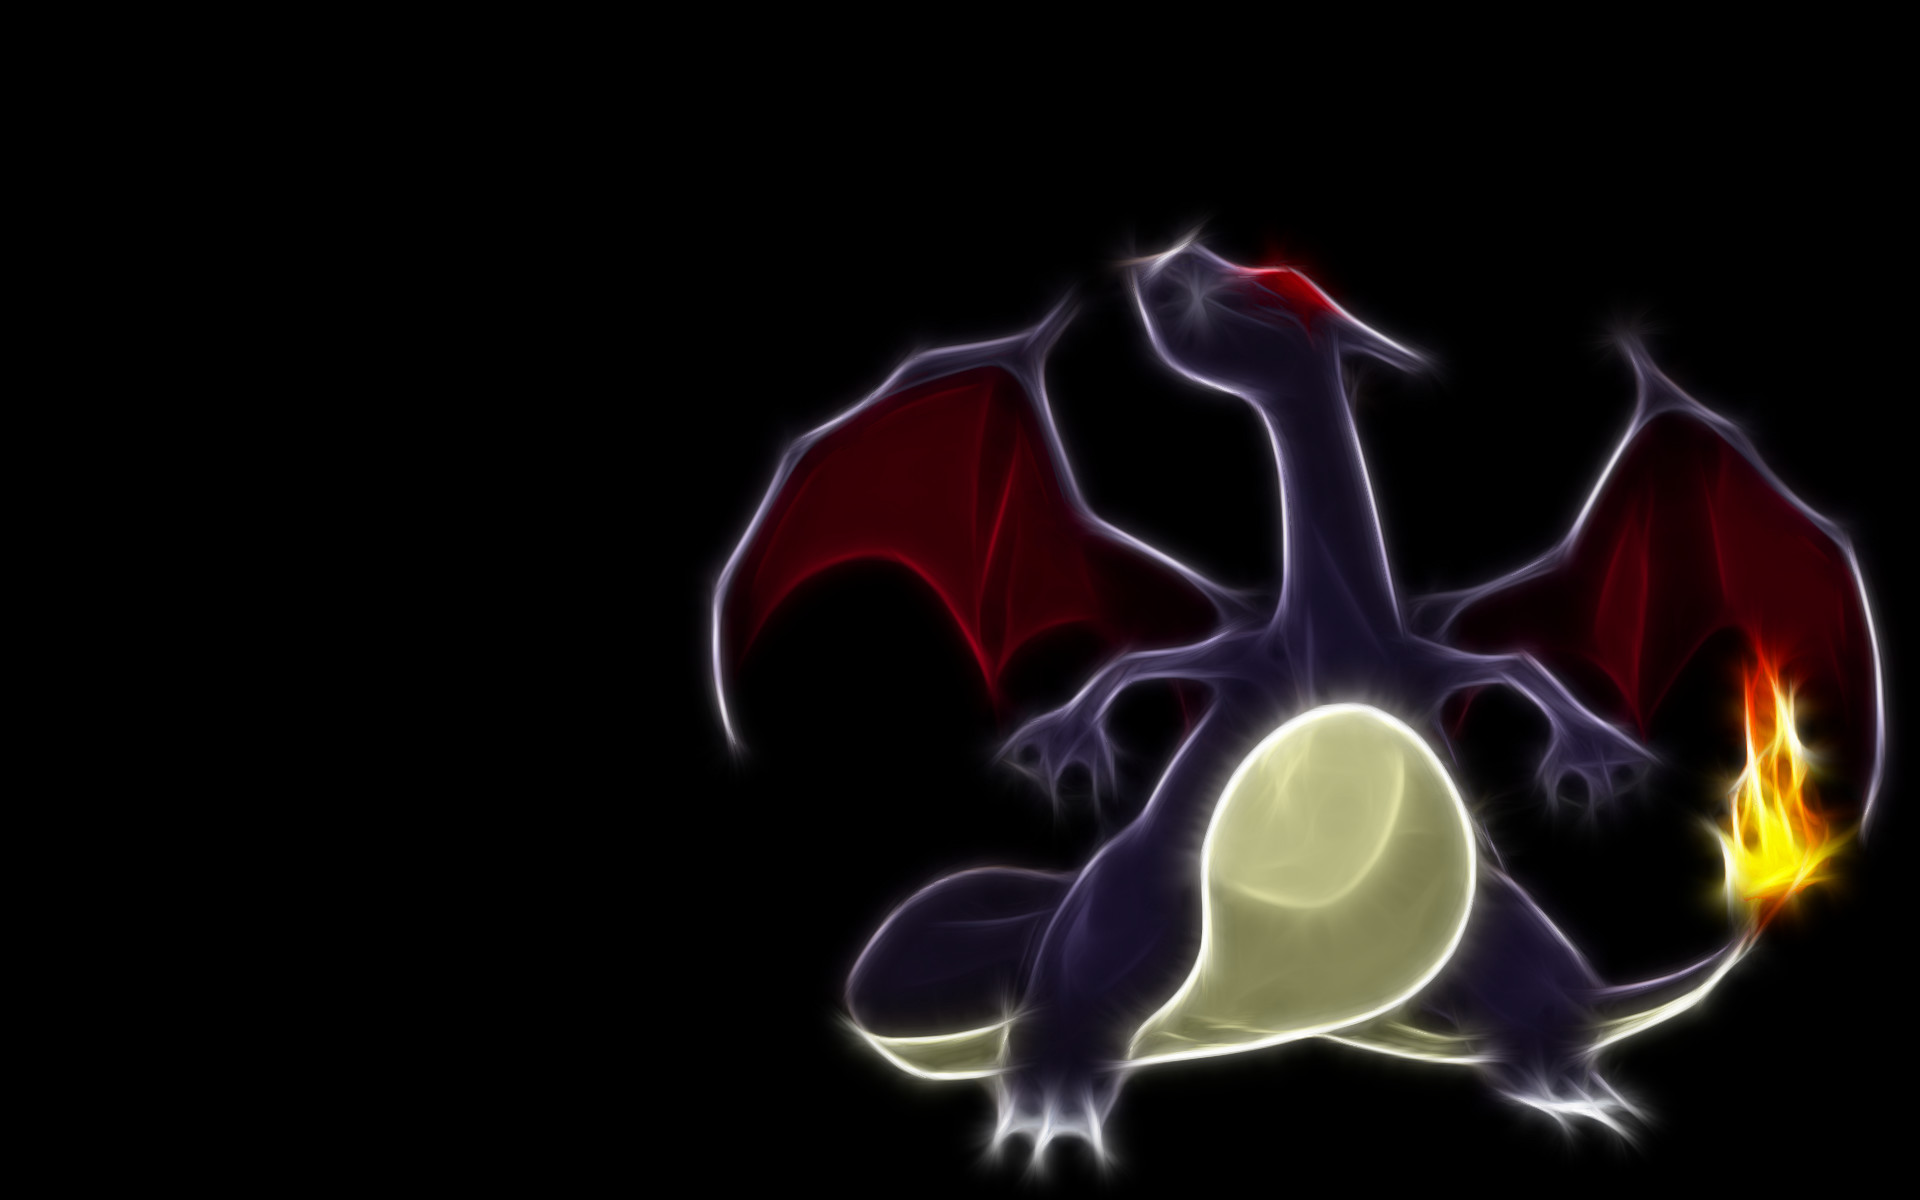 Shiny Pokemon HD Wallpapers, 772.14 Kb, Ivelisse Moone